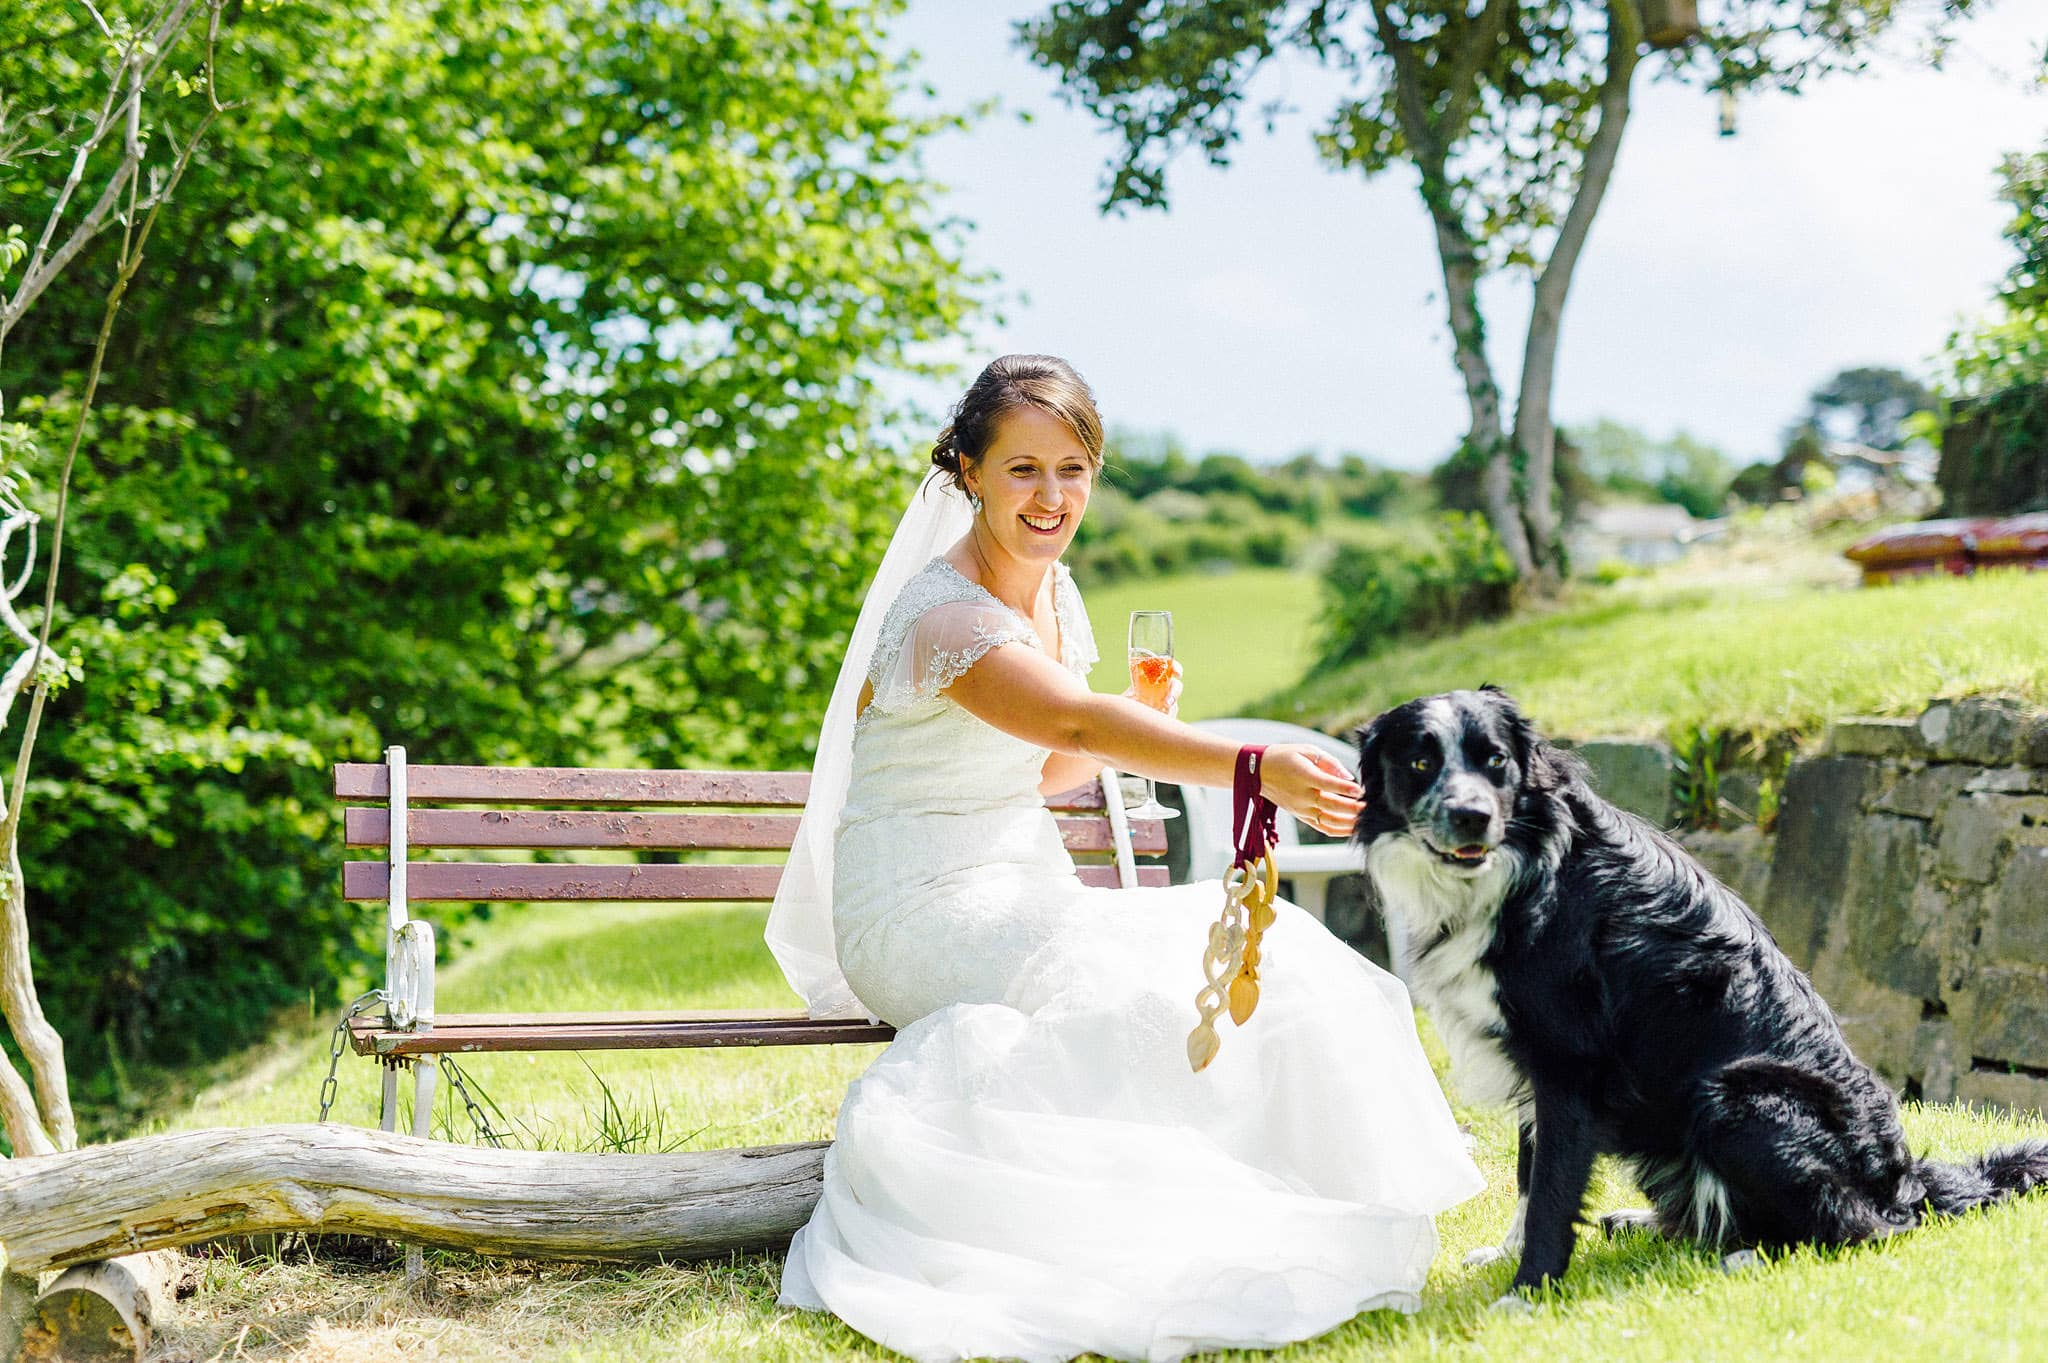 wedding-photographer-aberystwyth-wales (23)